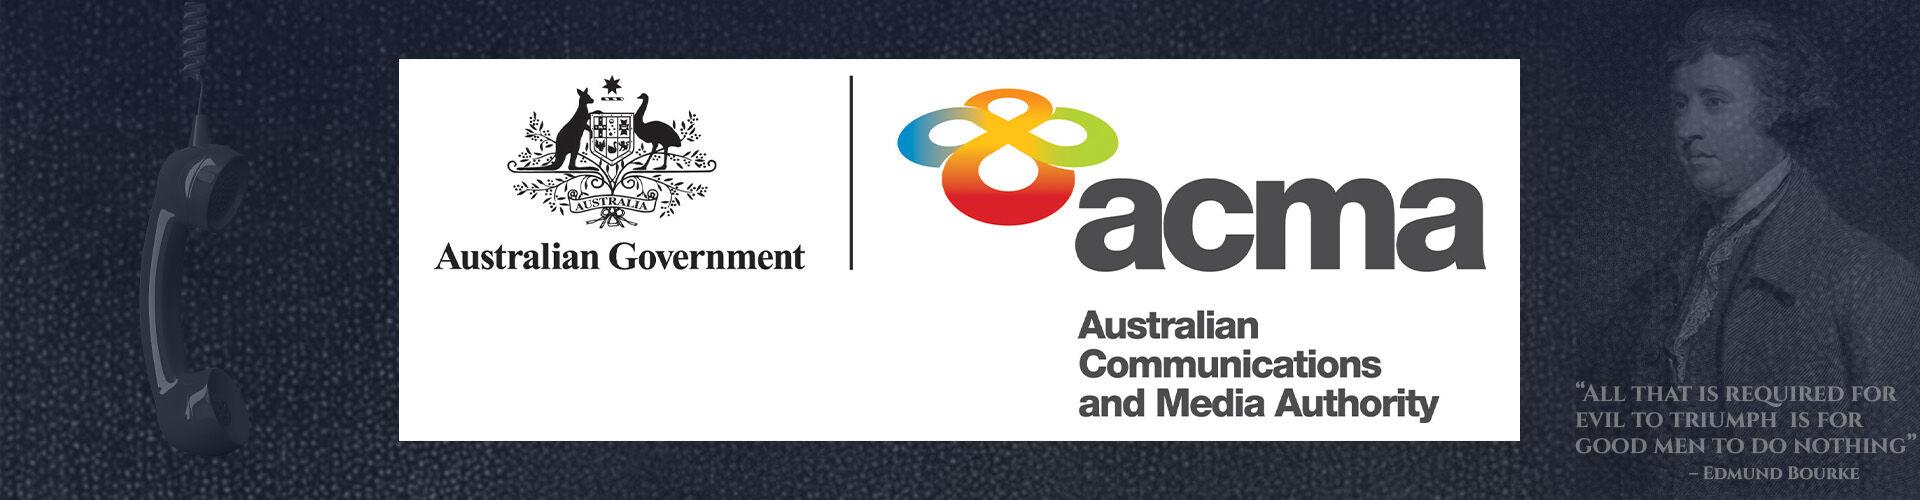 ACMA Australian Government